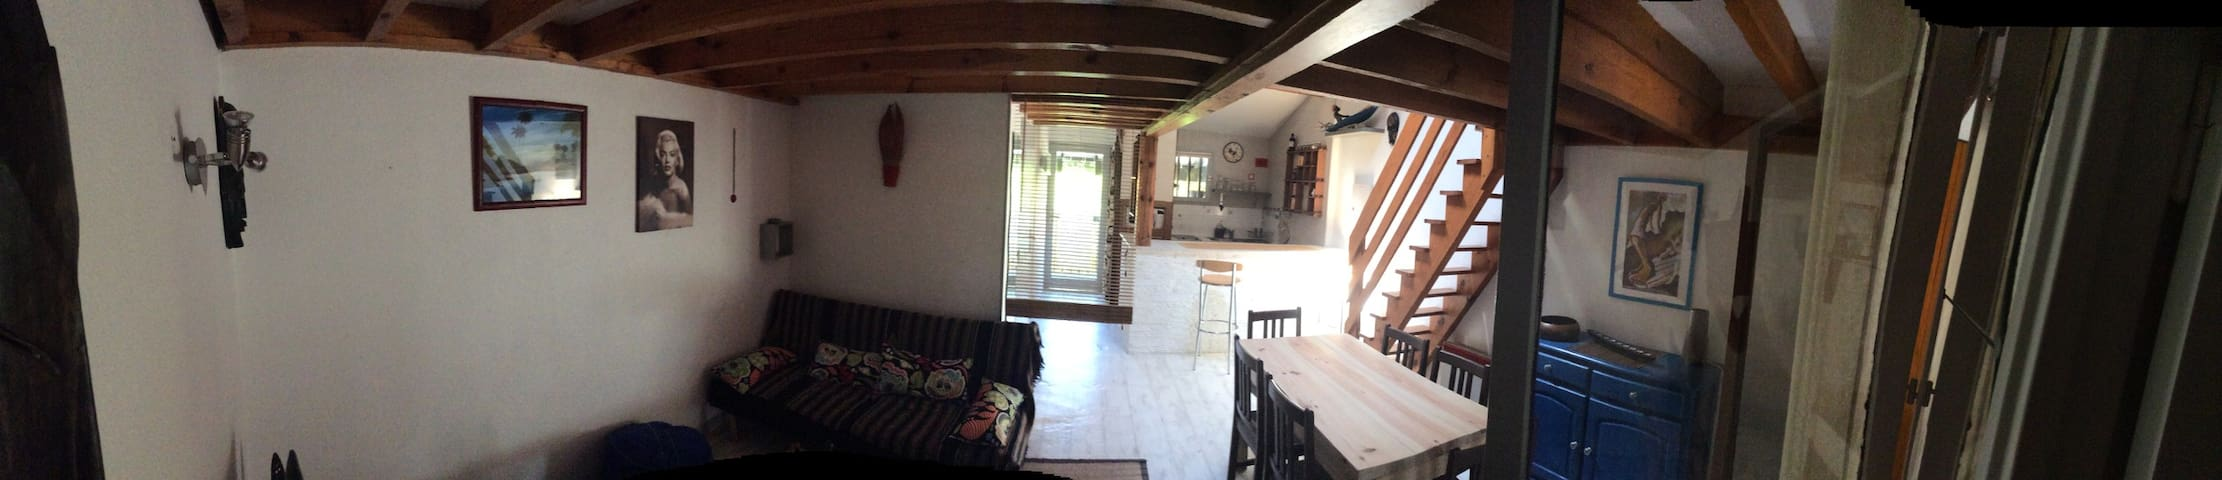 Duplex.Muy grande - Vieux-Boucau-les-Bains - Apartamento